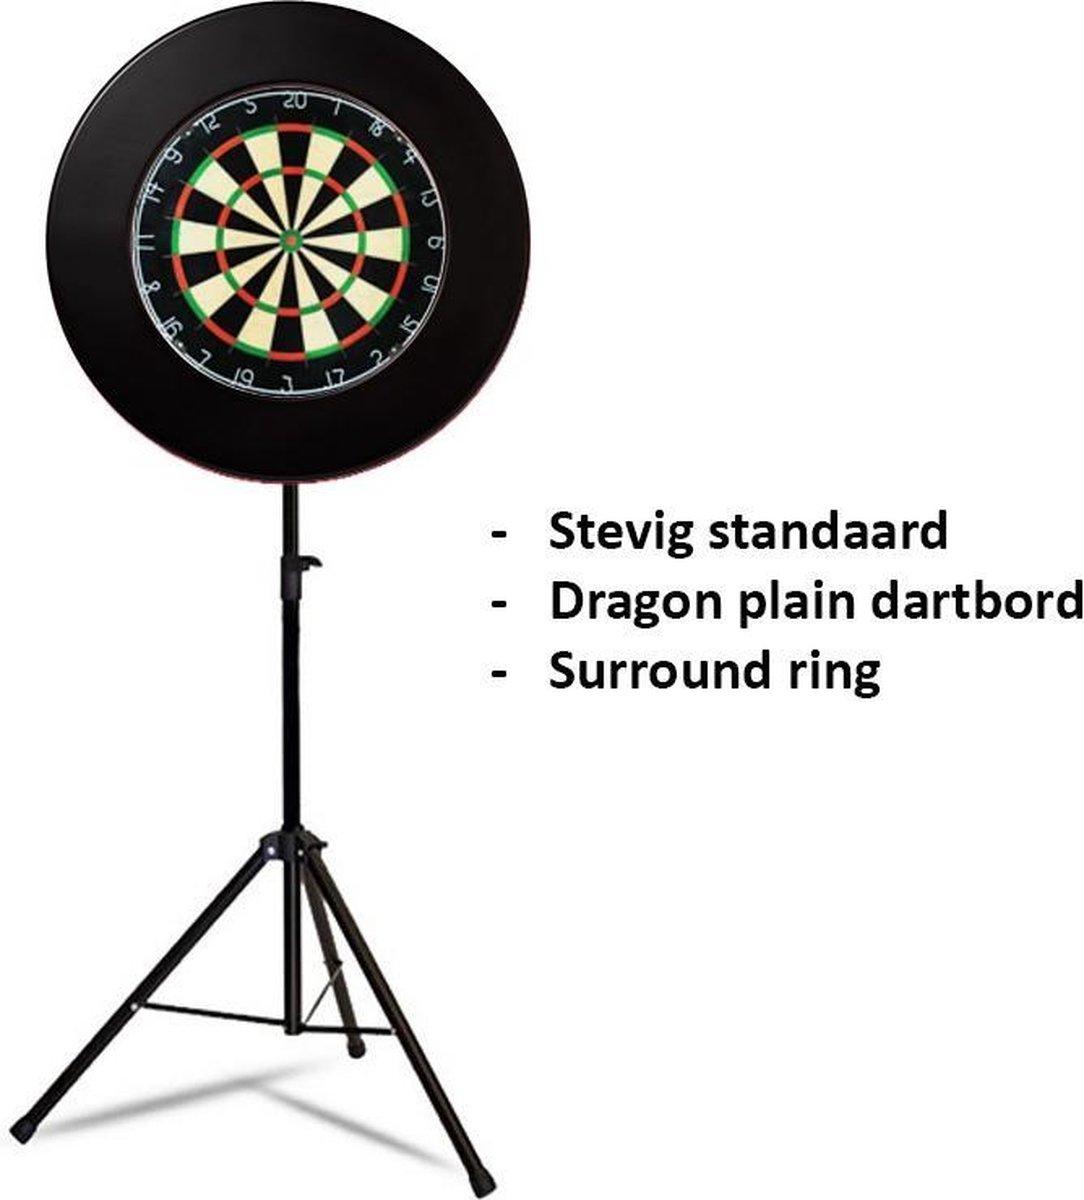 Dragon darts - Portable dartbord standaard pakket - inclusief best geteste - dartbord en - dartbord surround ring - zwart